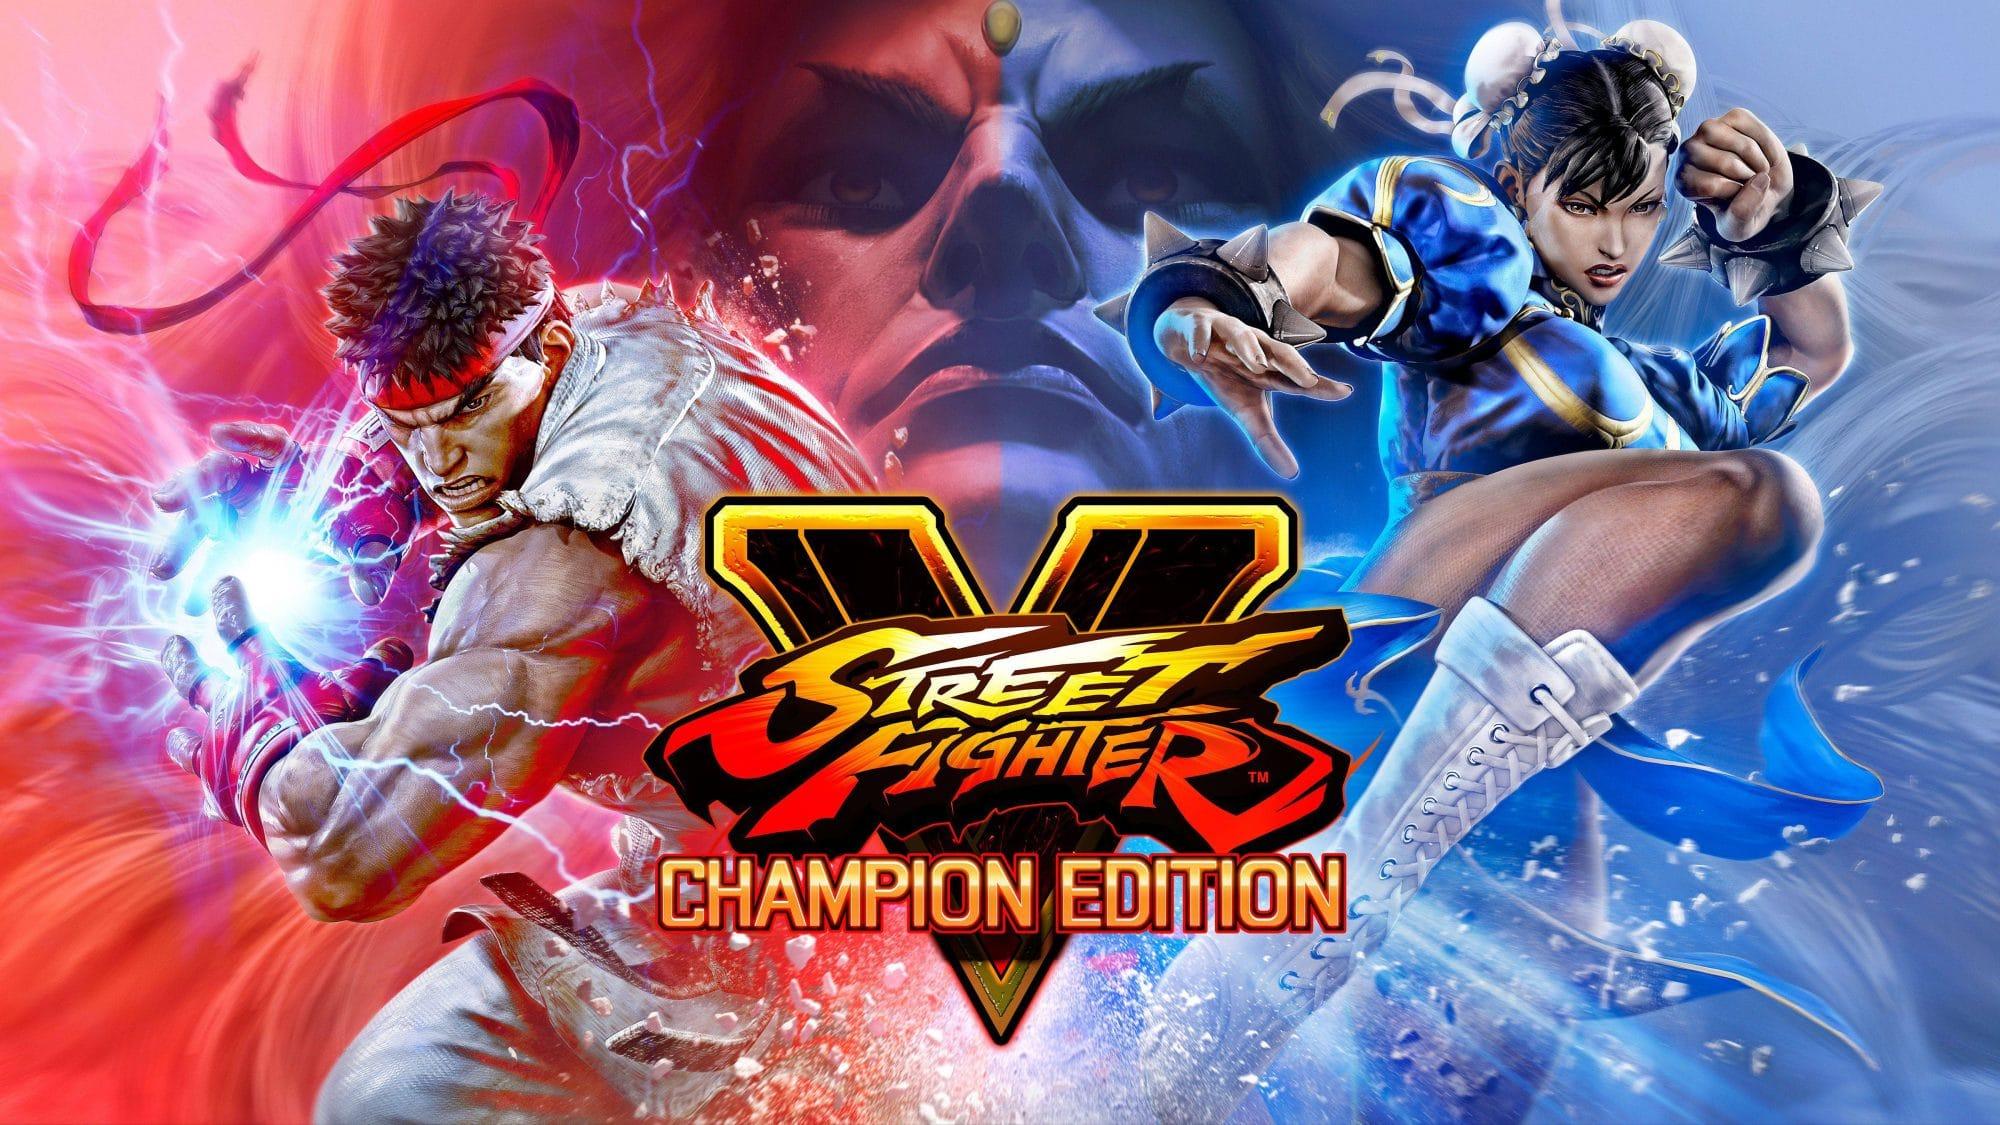 Street Fighter V: Champion Edition ufficiale, dal 14 febbraio 2020 thumbnail